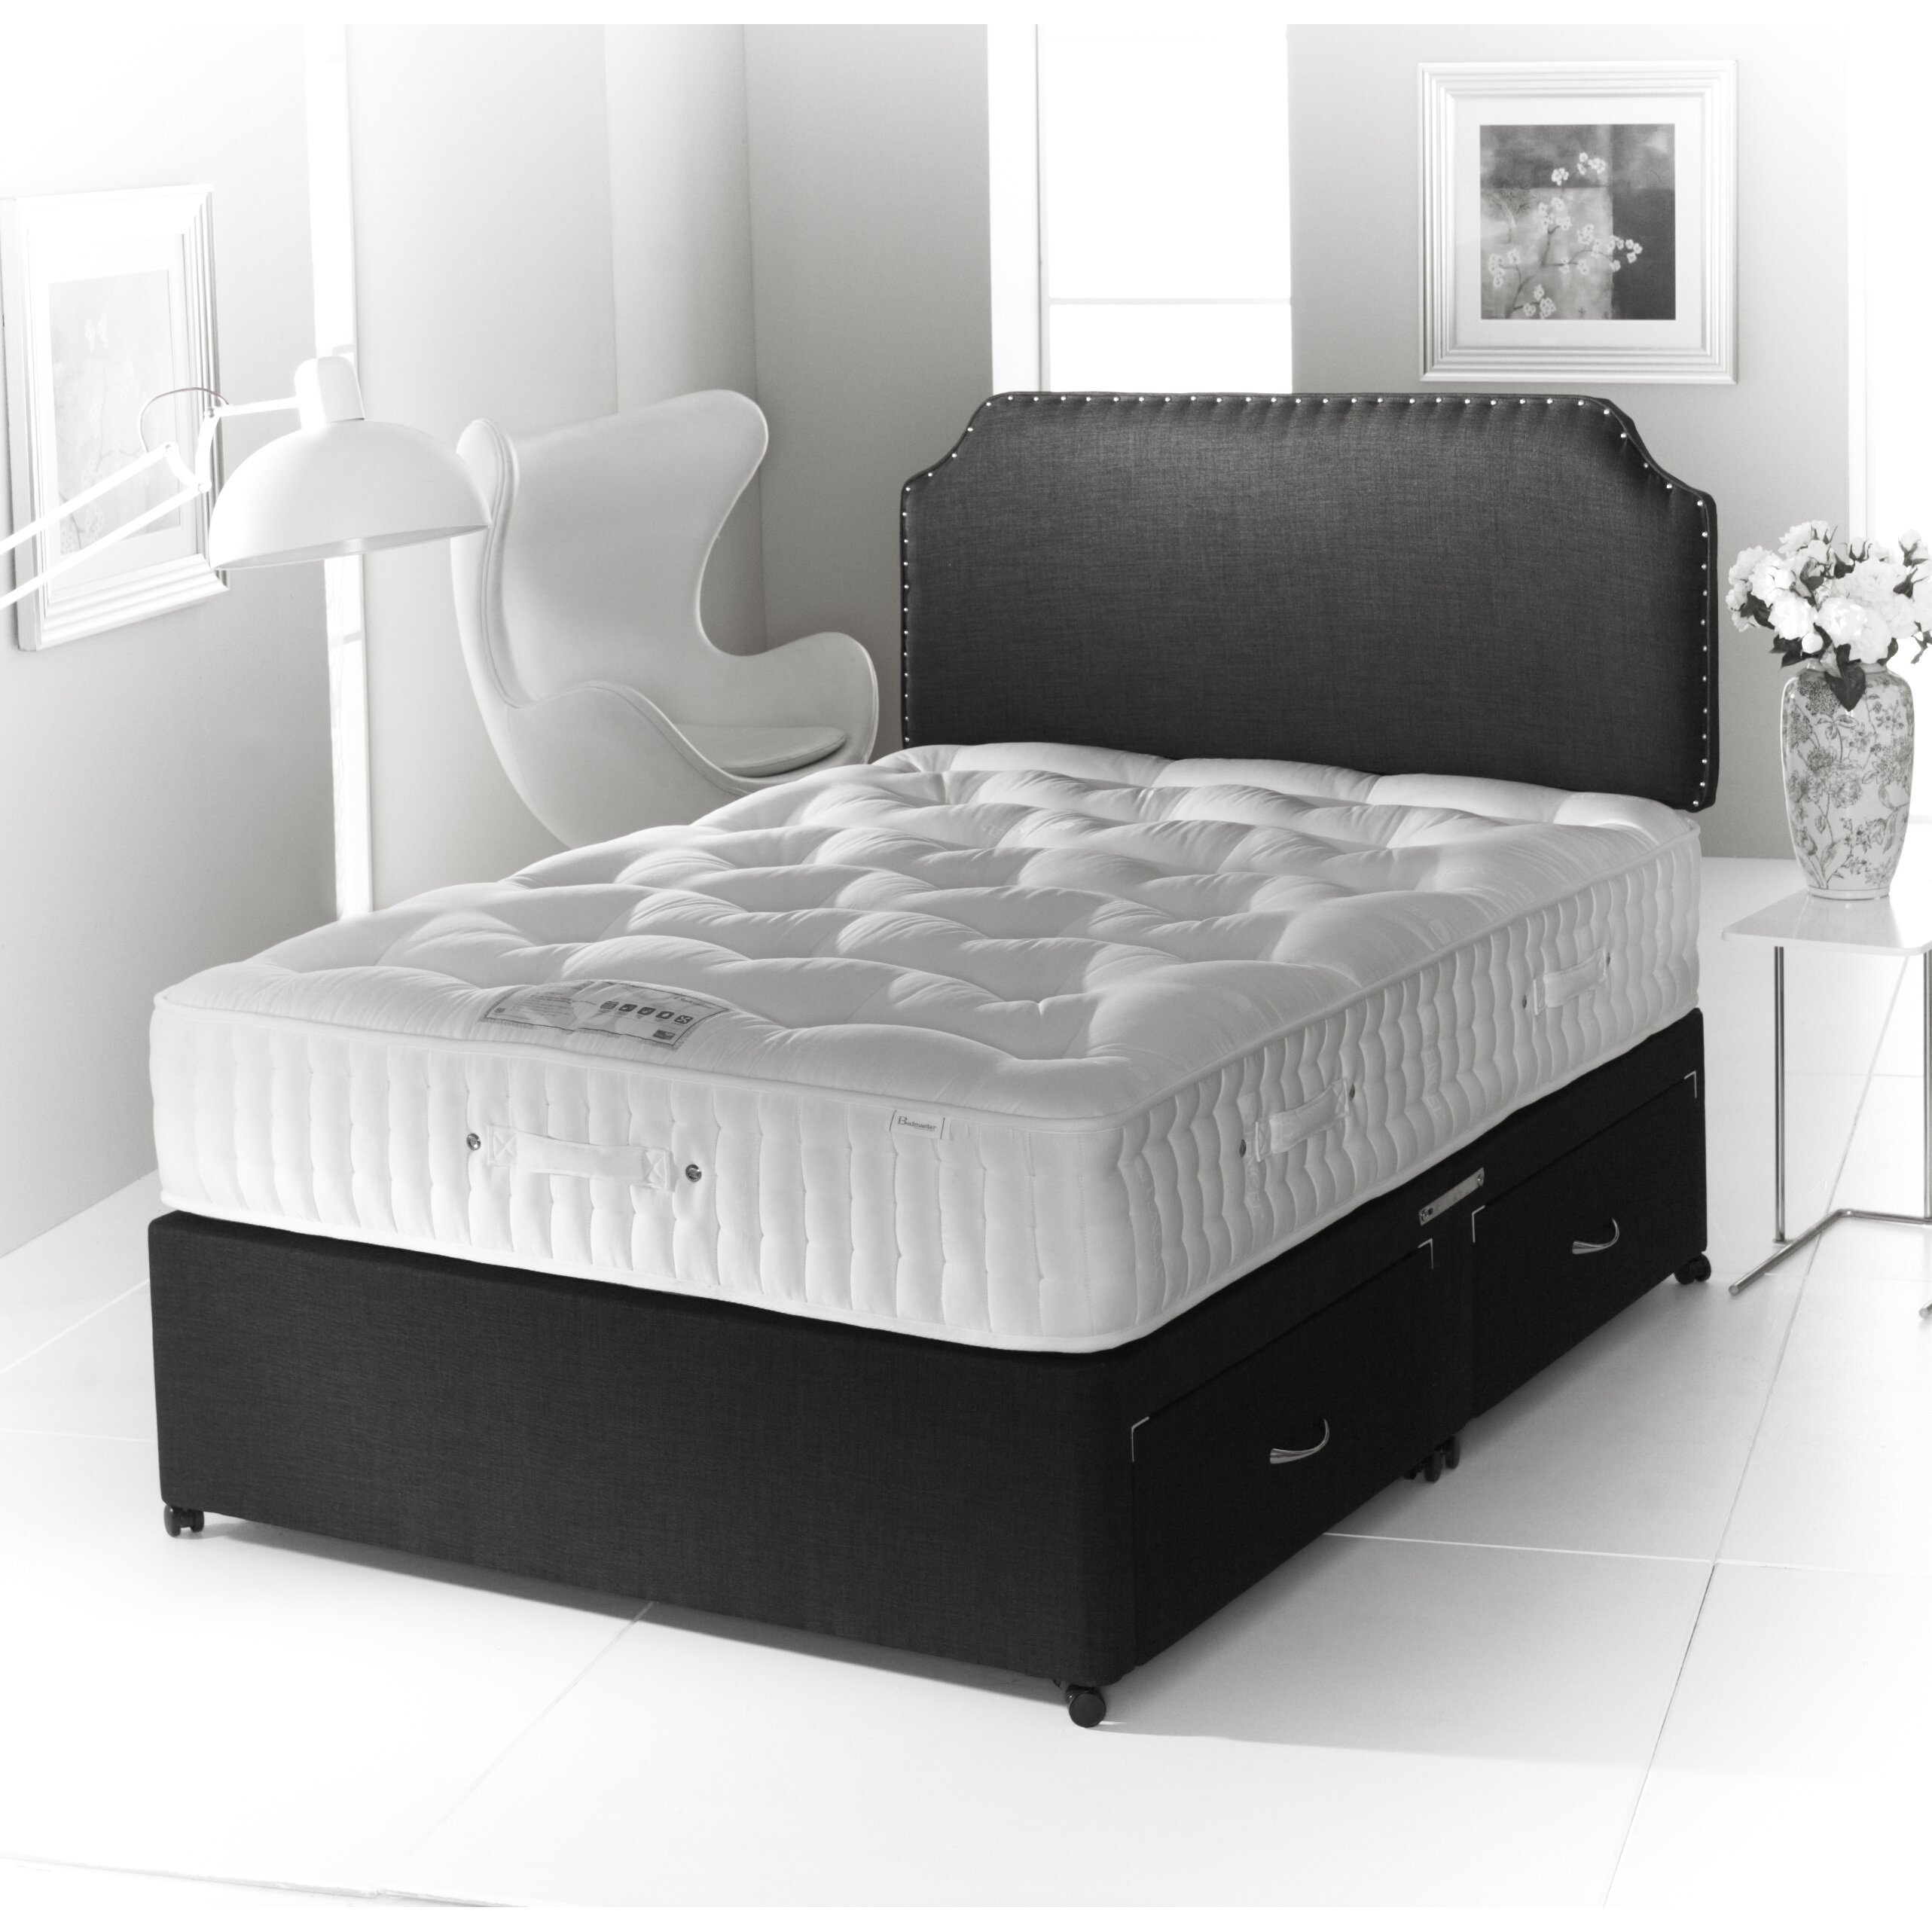 Home haus tennesse pocket sprung 4000 divan bed wayfair uk for Pocket sprung divan beds sale